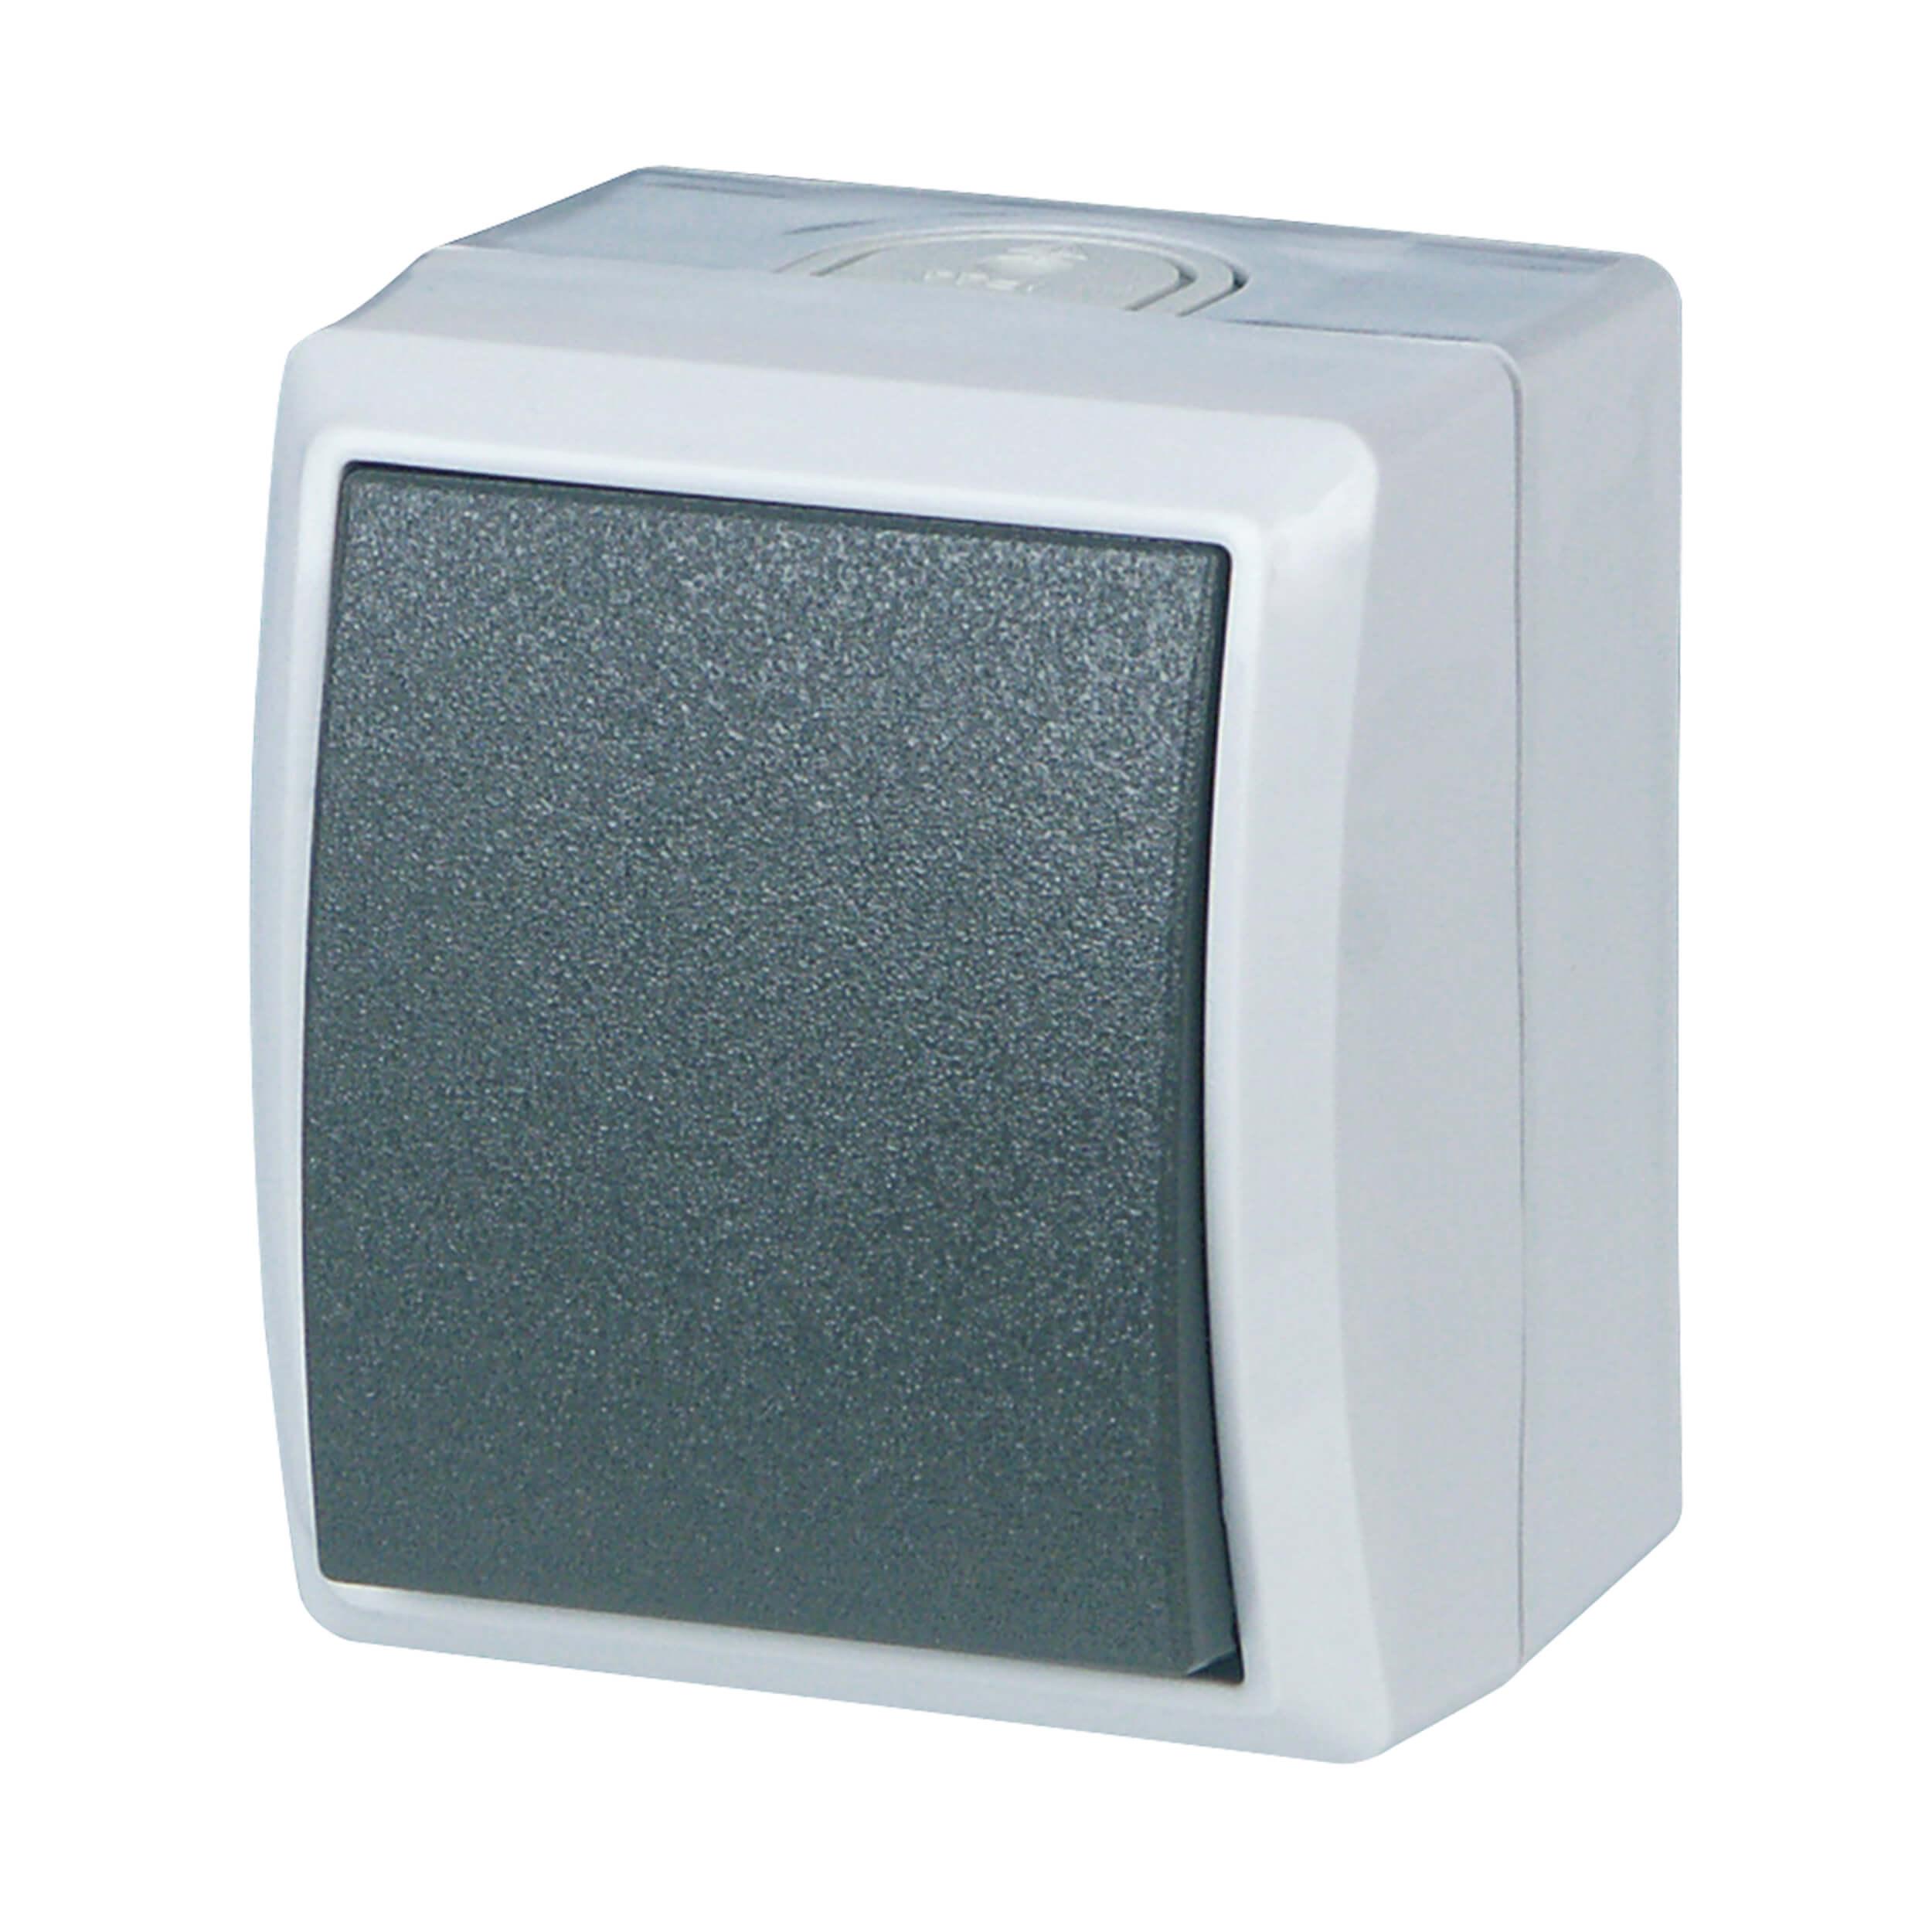 AquaForm Taster für feuchte Räume, grau